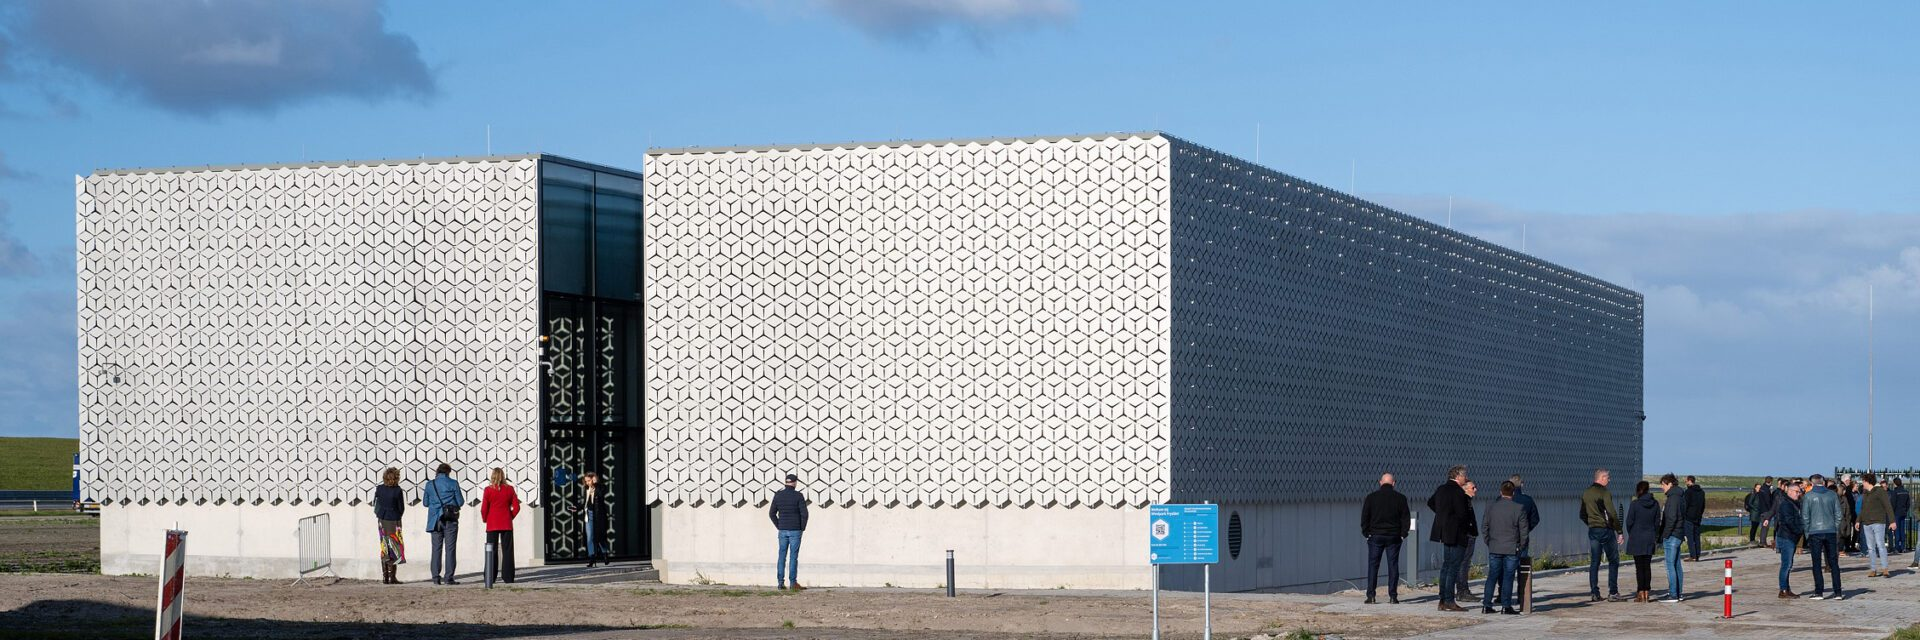 Trtanformatorstation Windpark Fryslan bij Breenzanddijk